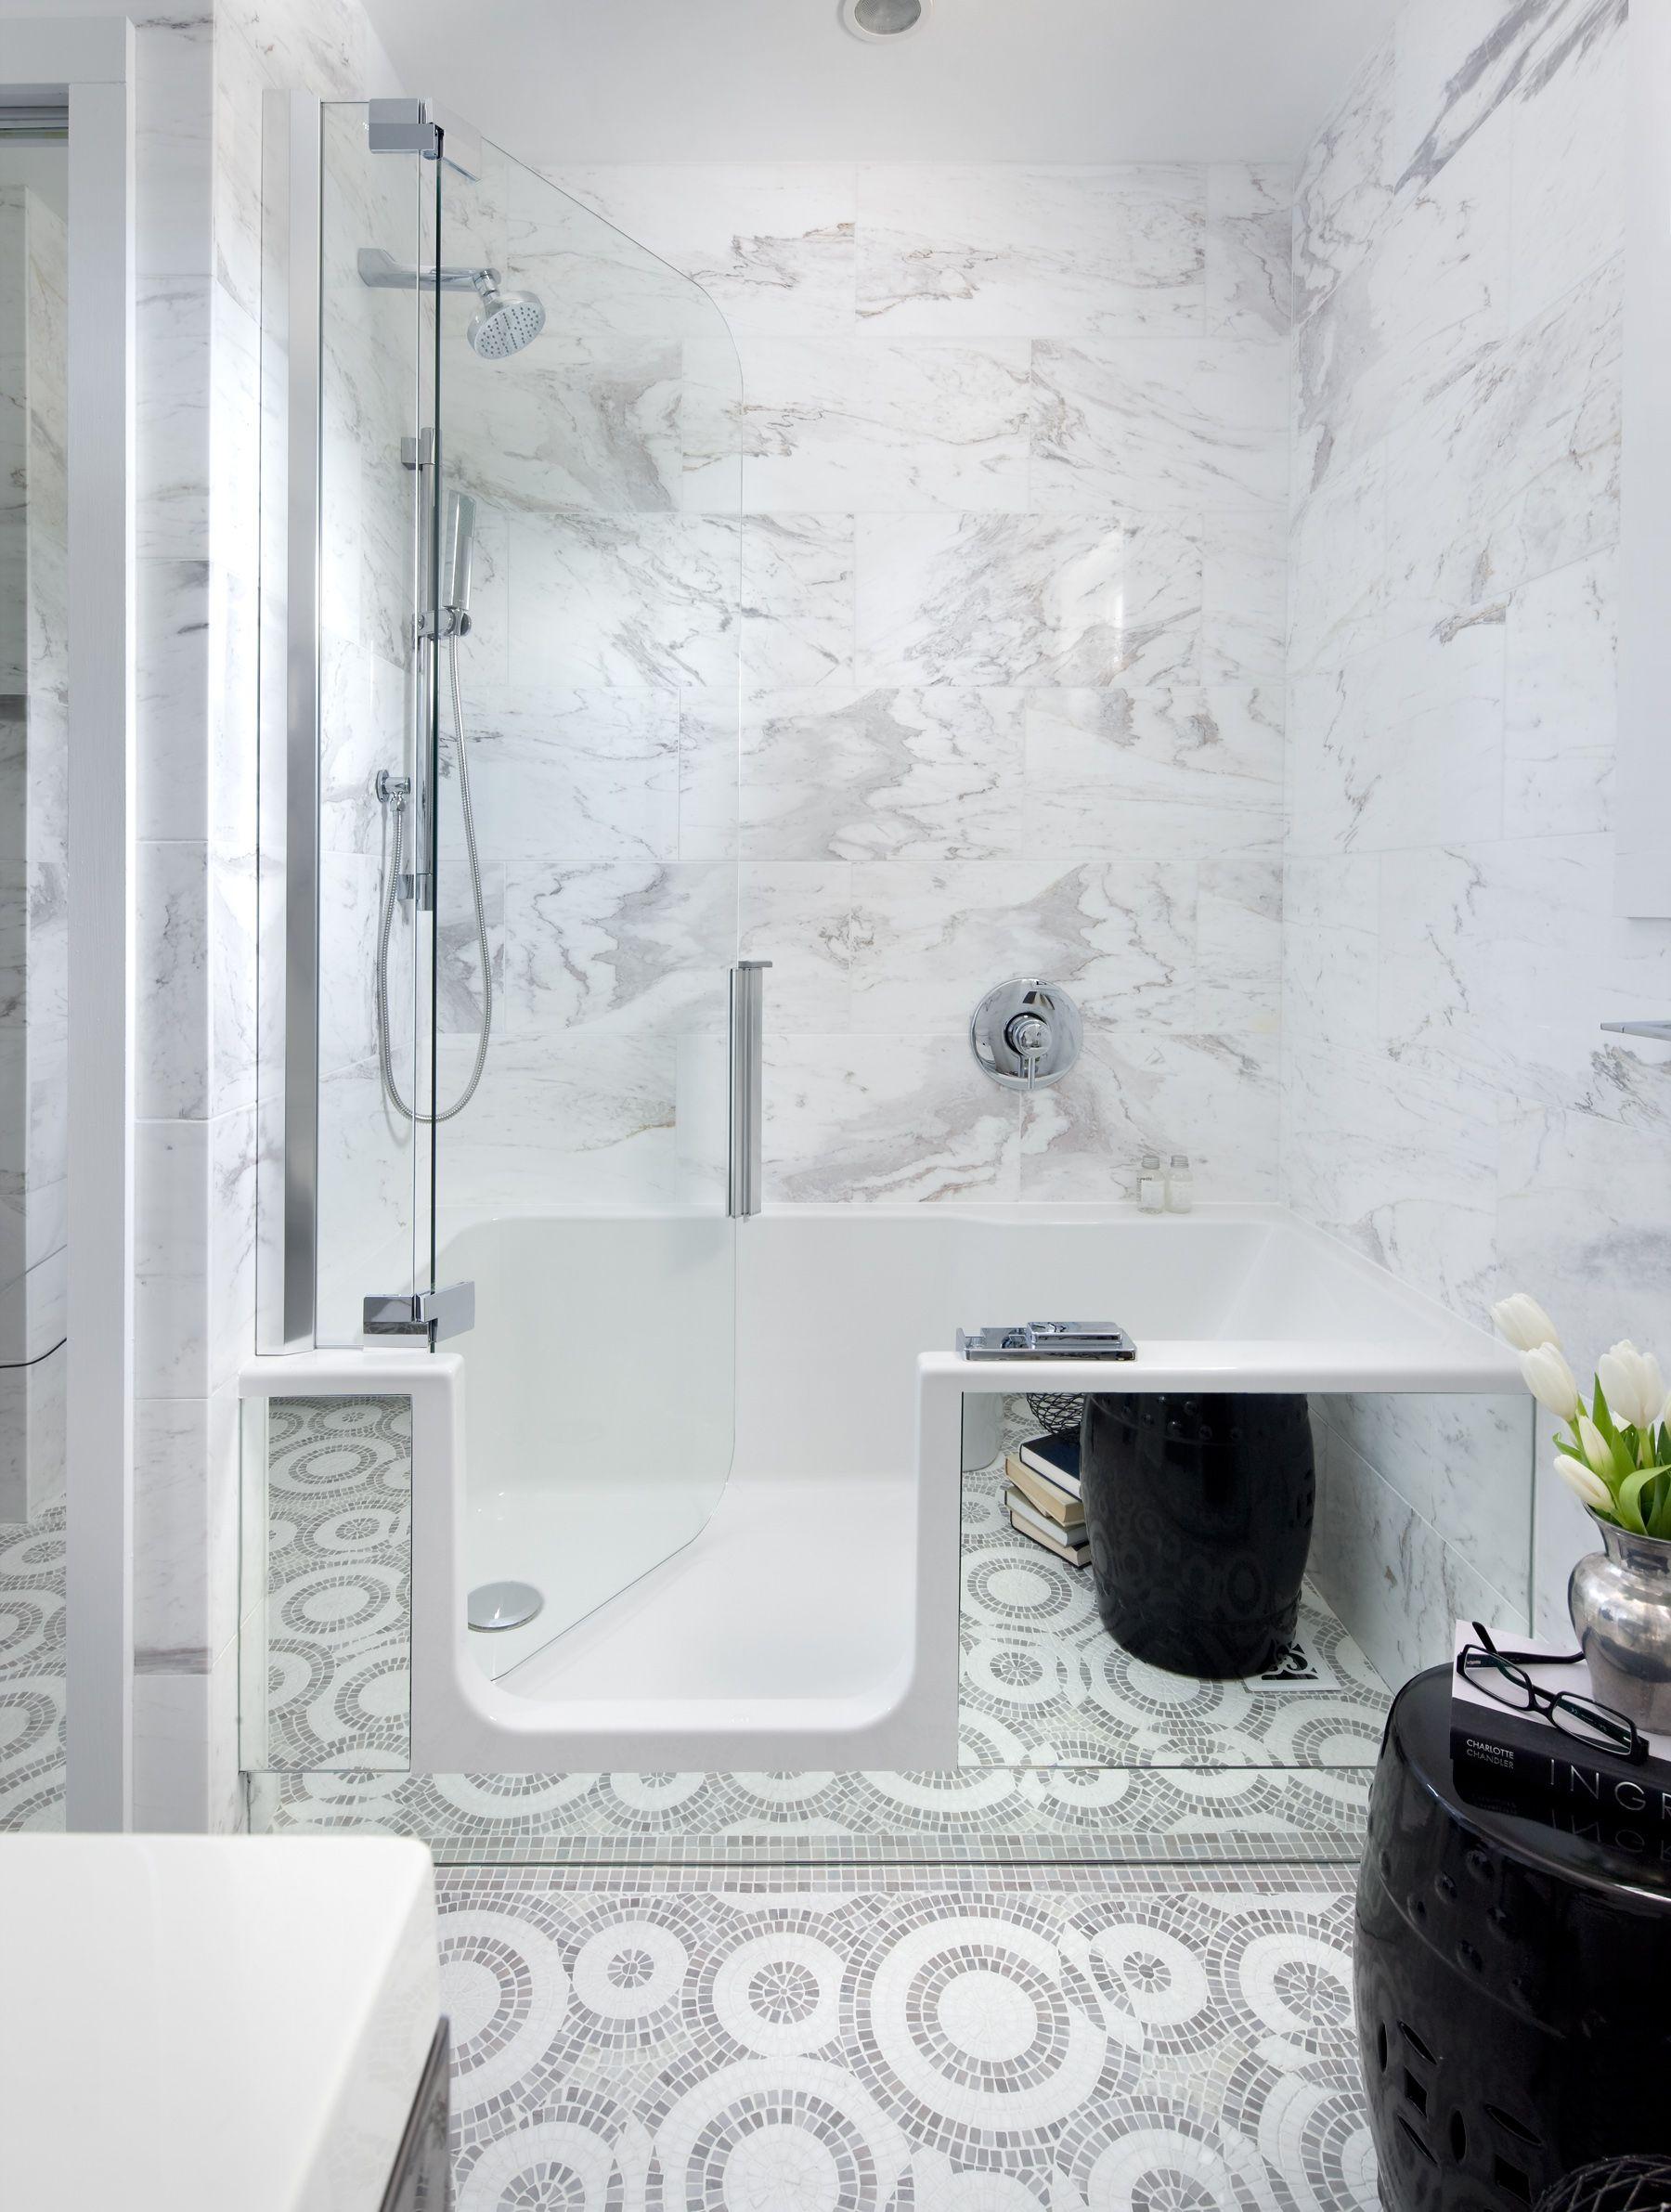 Bathe In Style Bathroom Tub Shower Combo Bathtub Shower Combo Bathroom Tub Shower